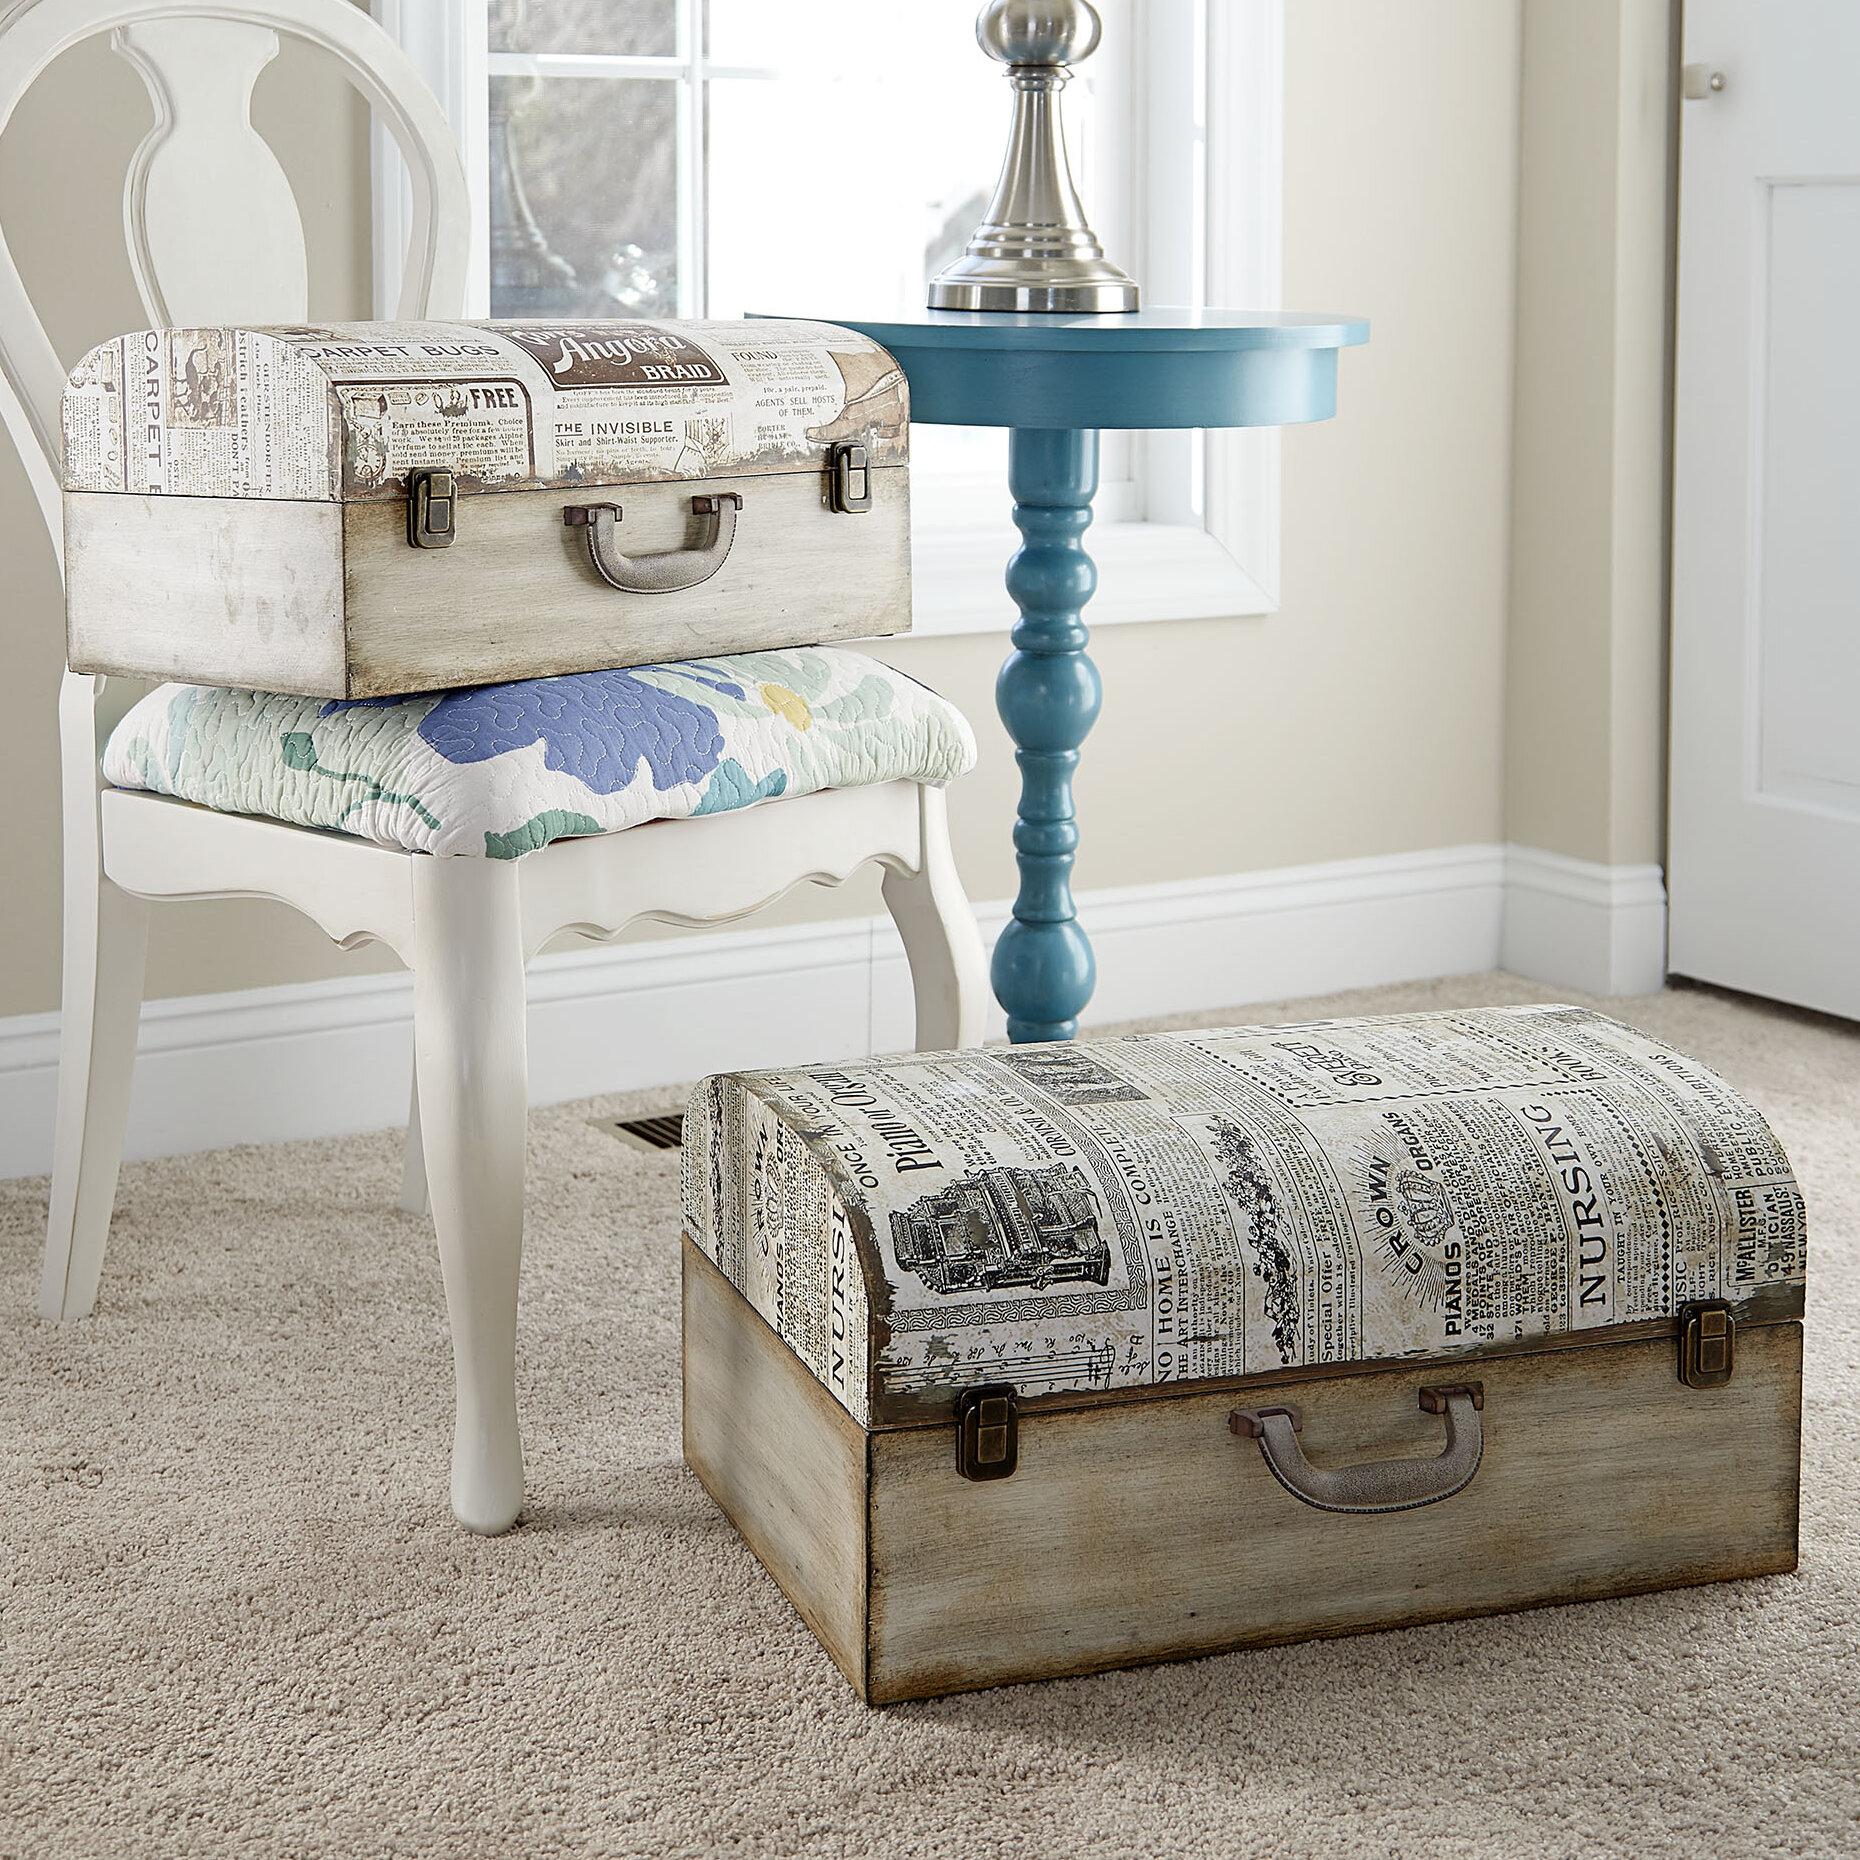 Household Essentials 2 Piece Newspaper Suitcase Trunk Set